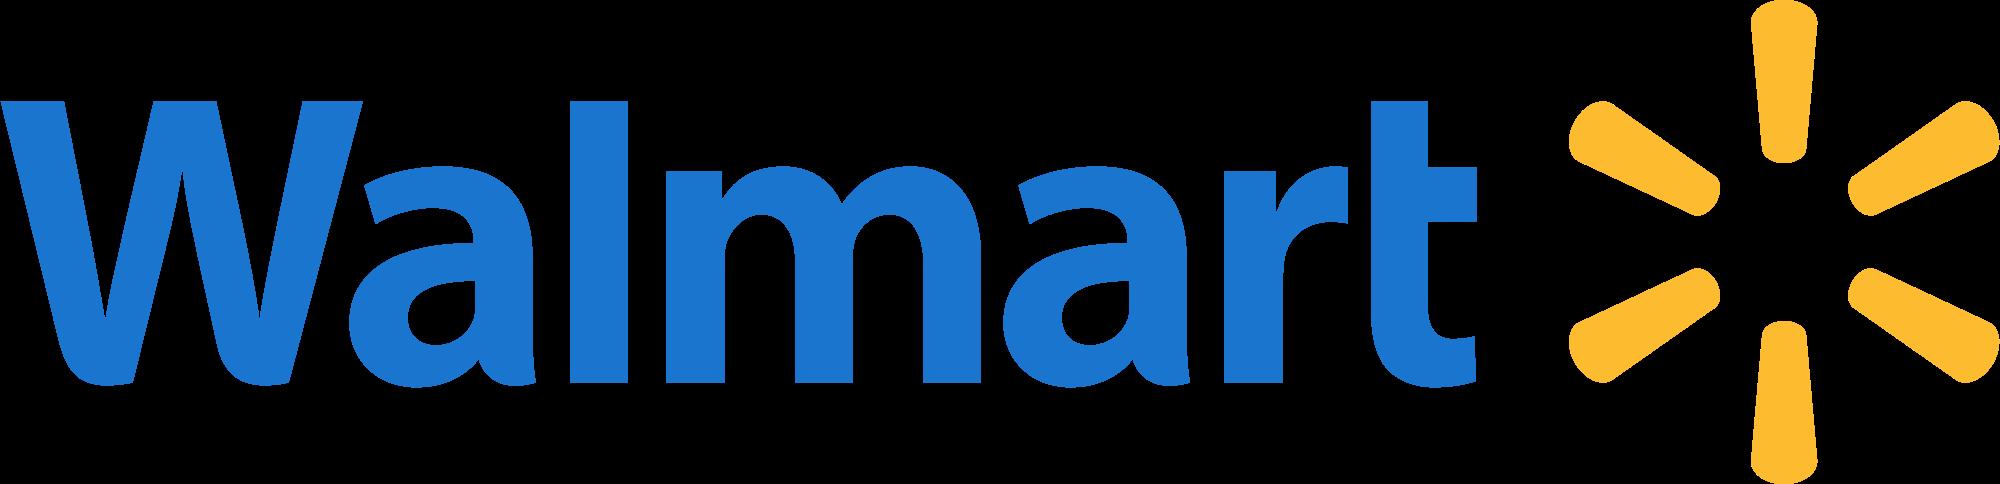 logo_walmart_02